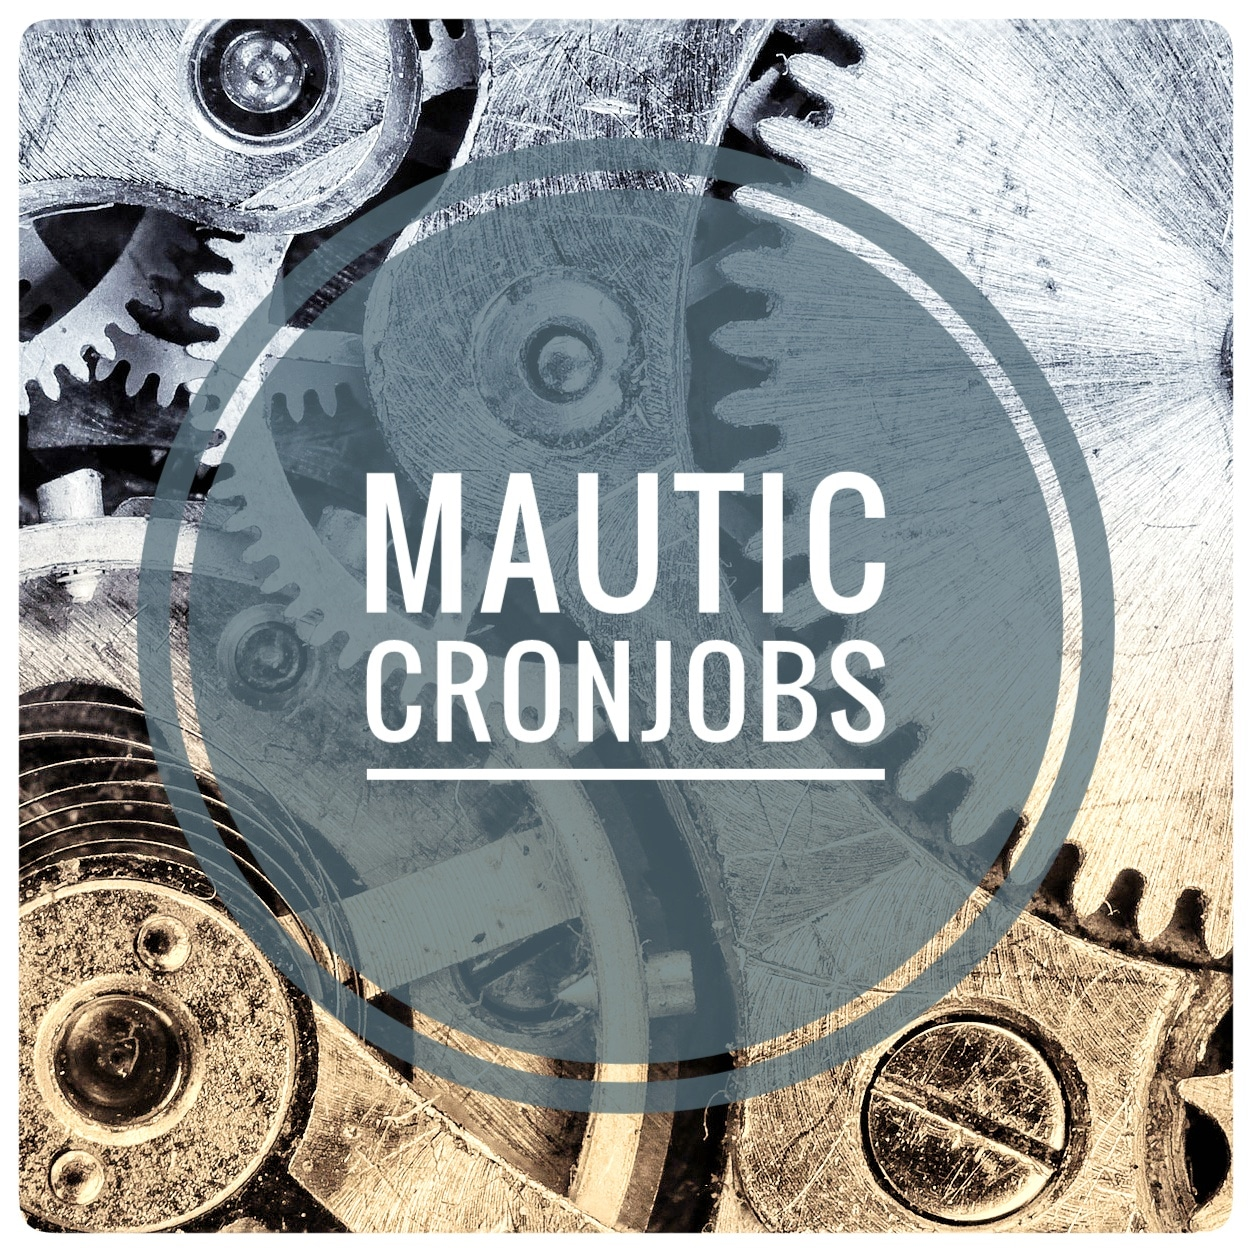 Mautic Cron Jobs howto